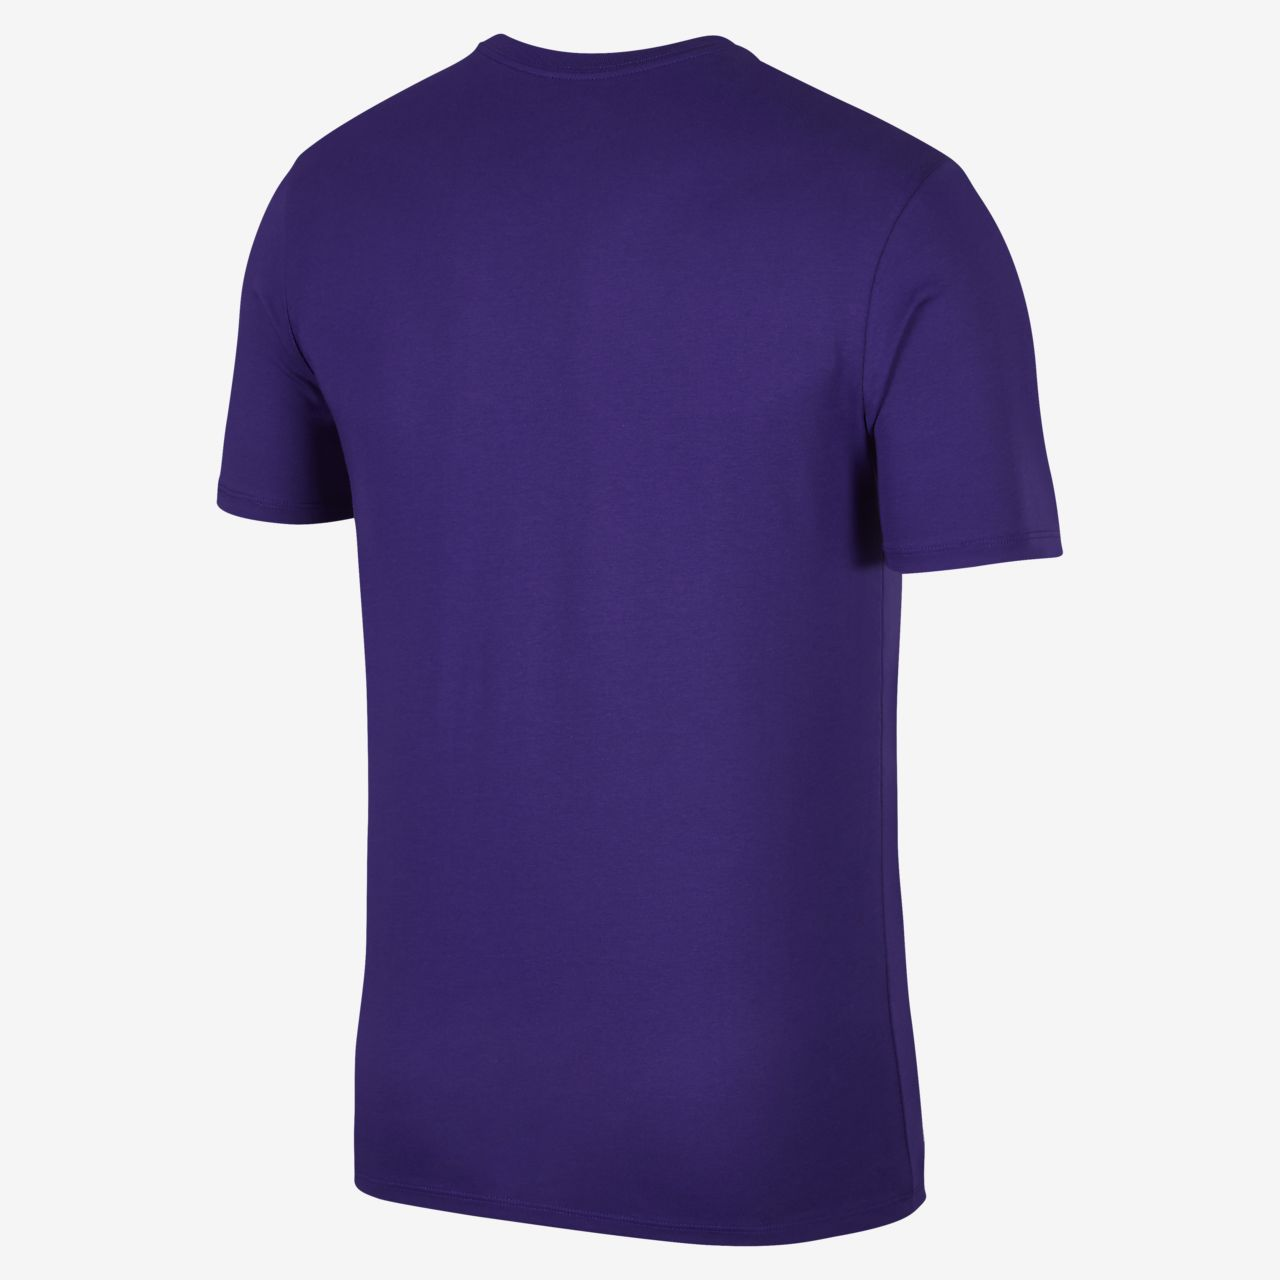 687ba0b92a2 Los Angeles Lakers City Edition Nike Dri-FIT Men s NBA T-Shirt. Nike ...